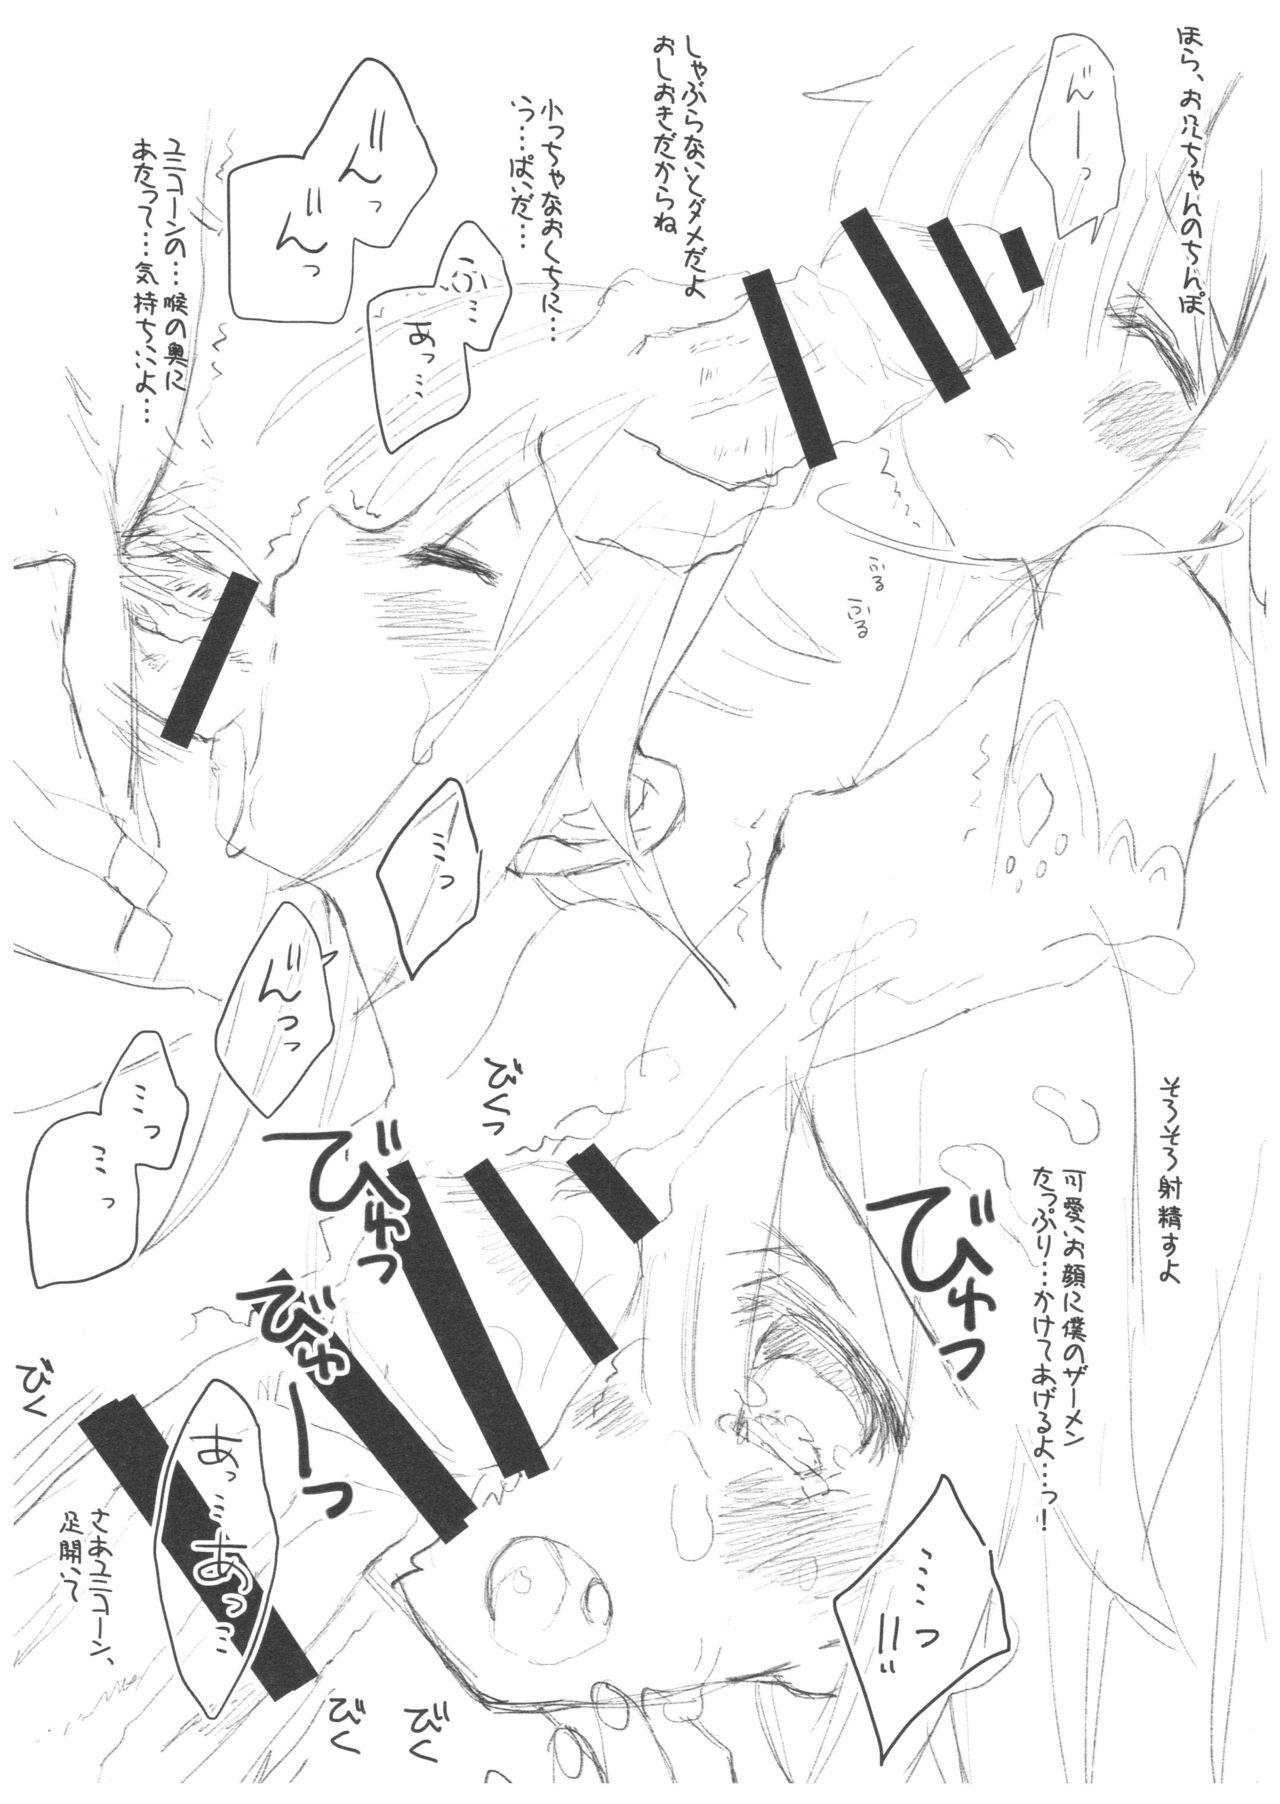 Adesugata Kantai Musume Zappon 2